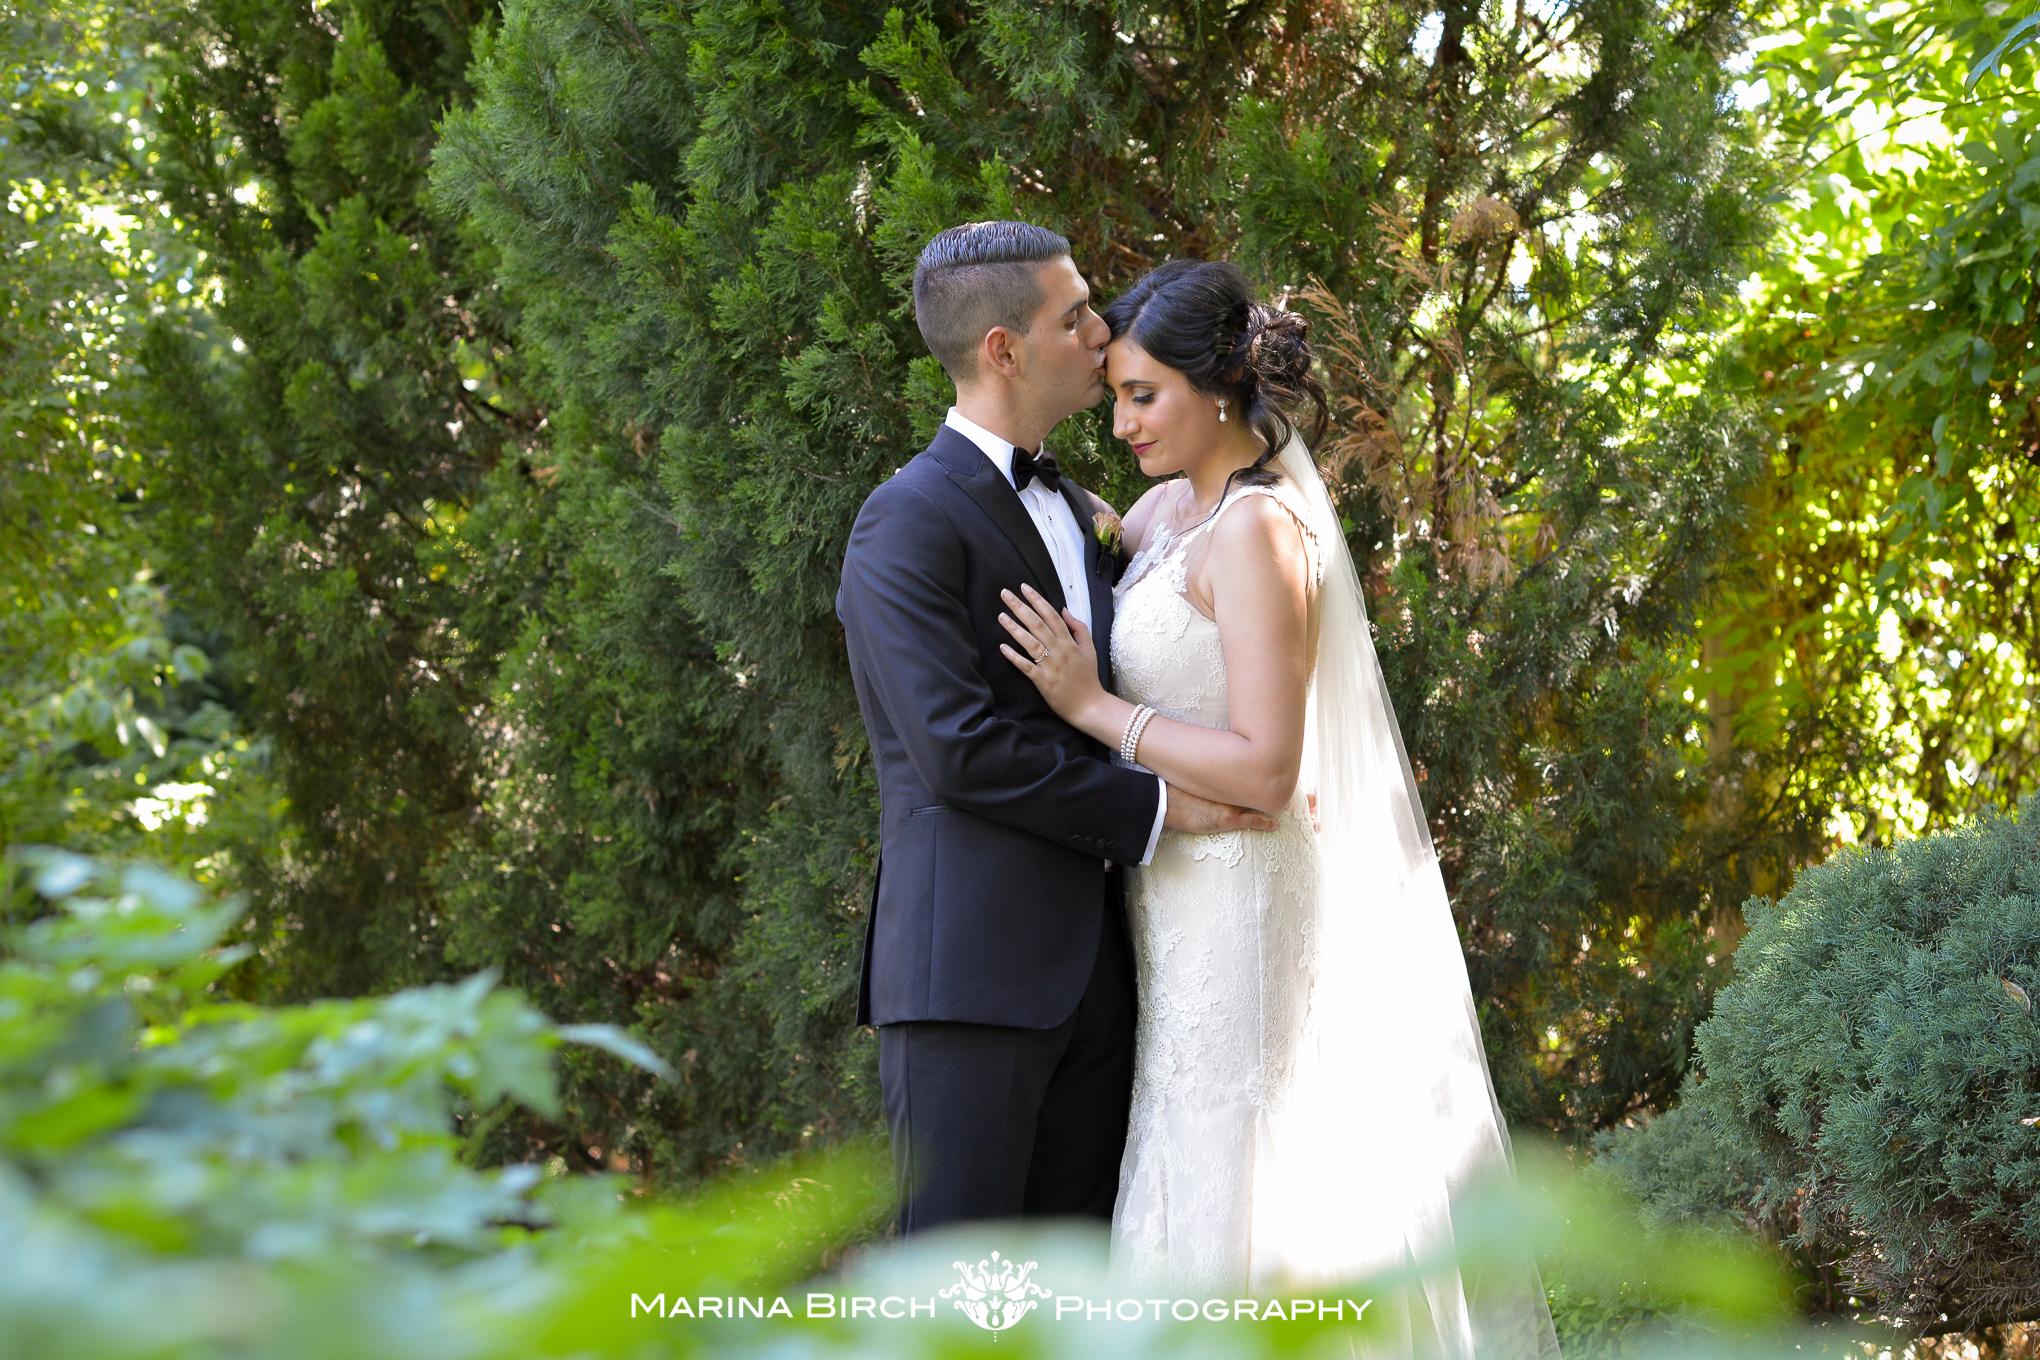 MBP.Lava wedding -17.jpg